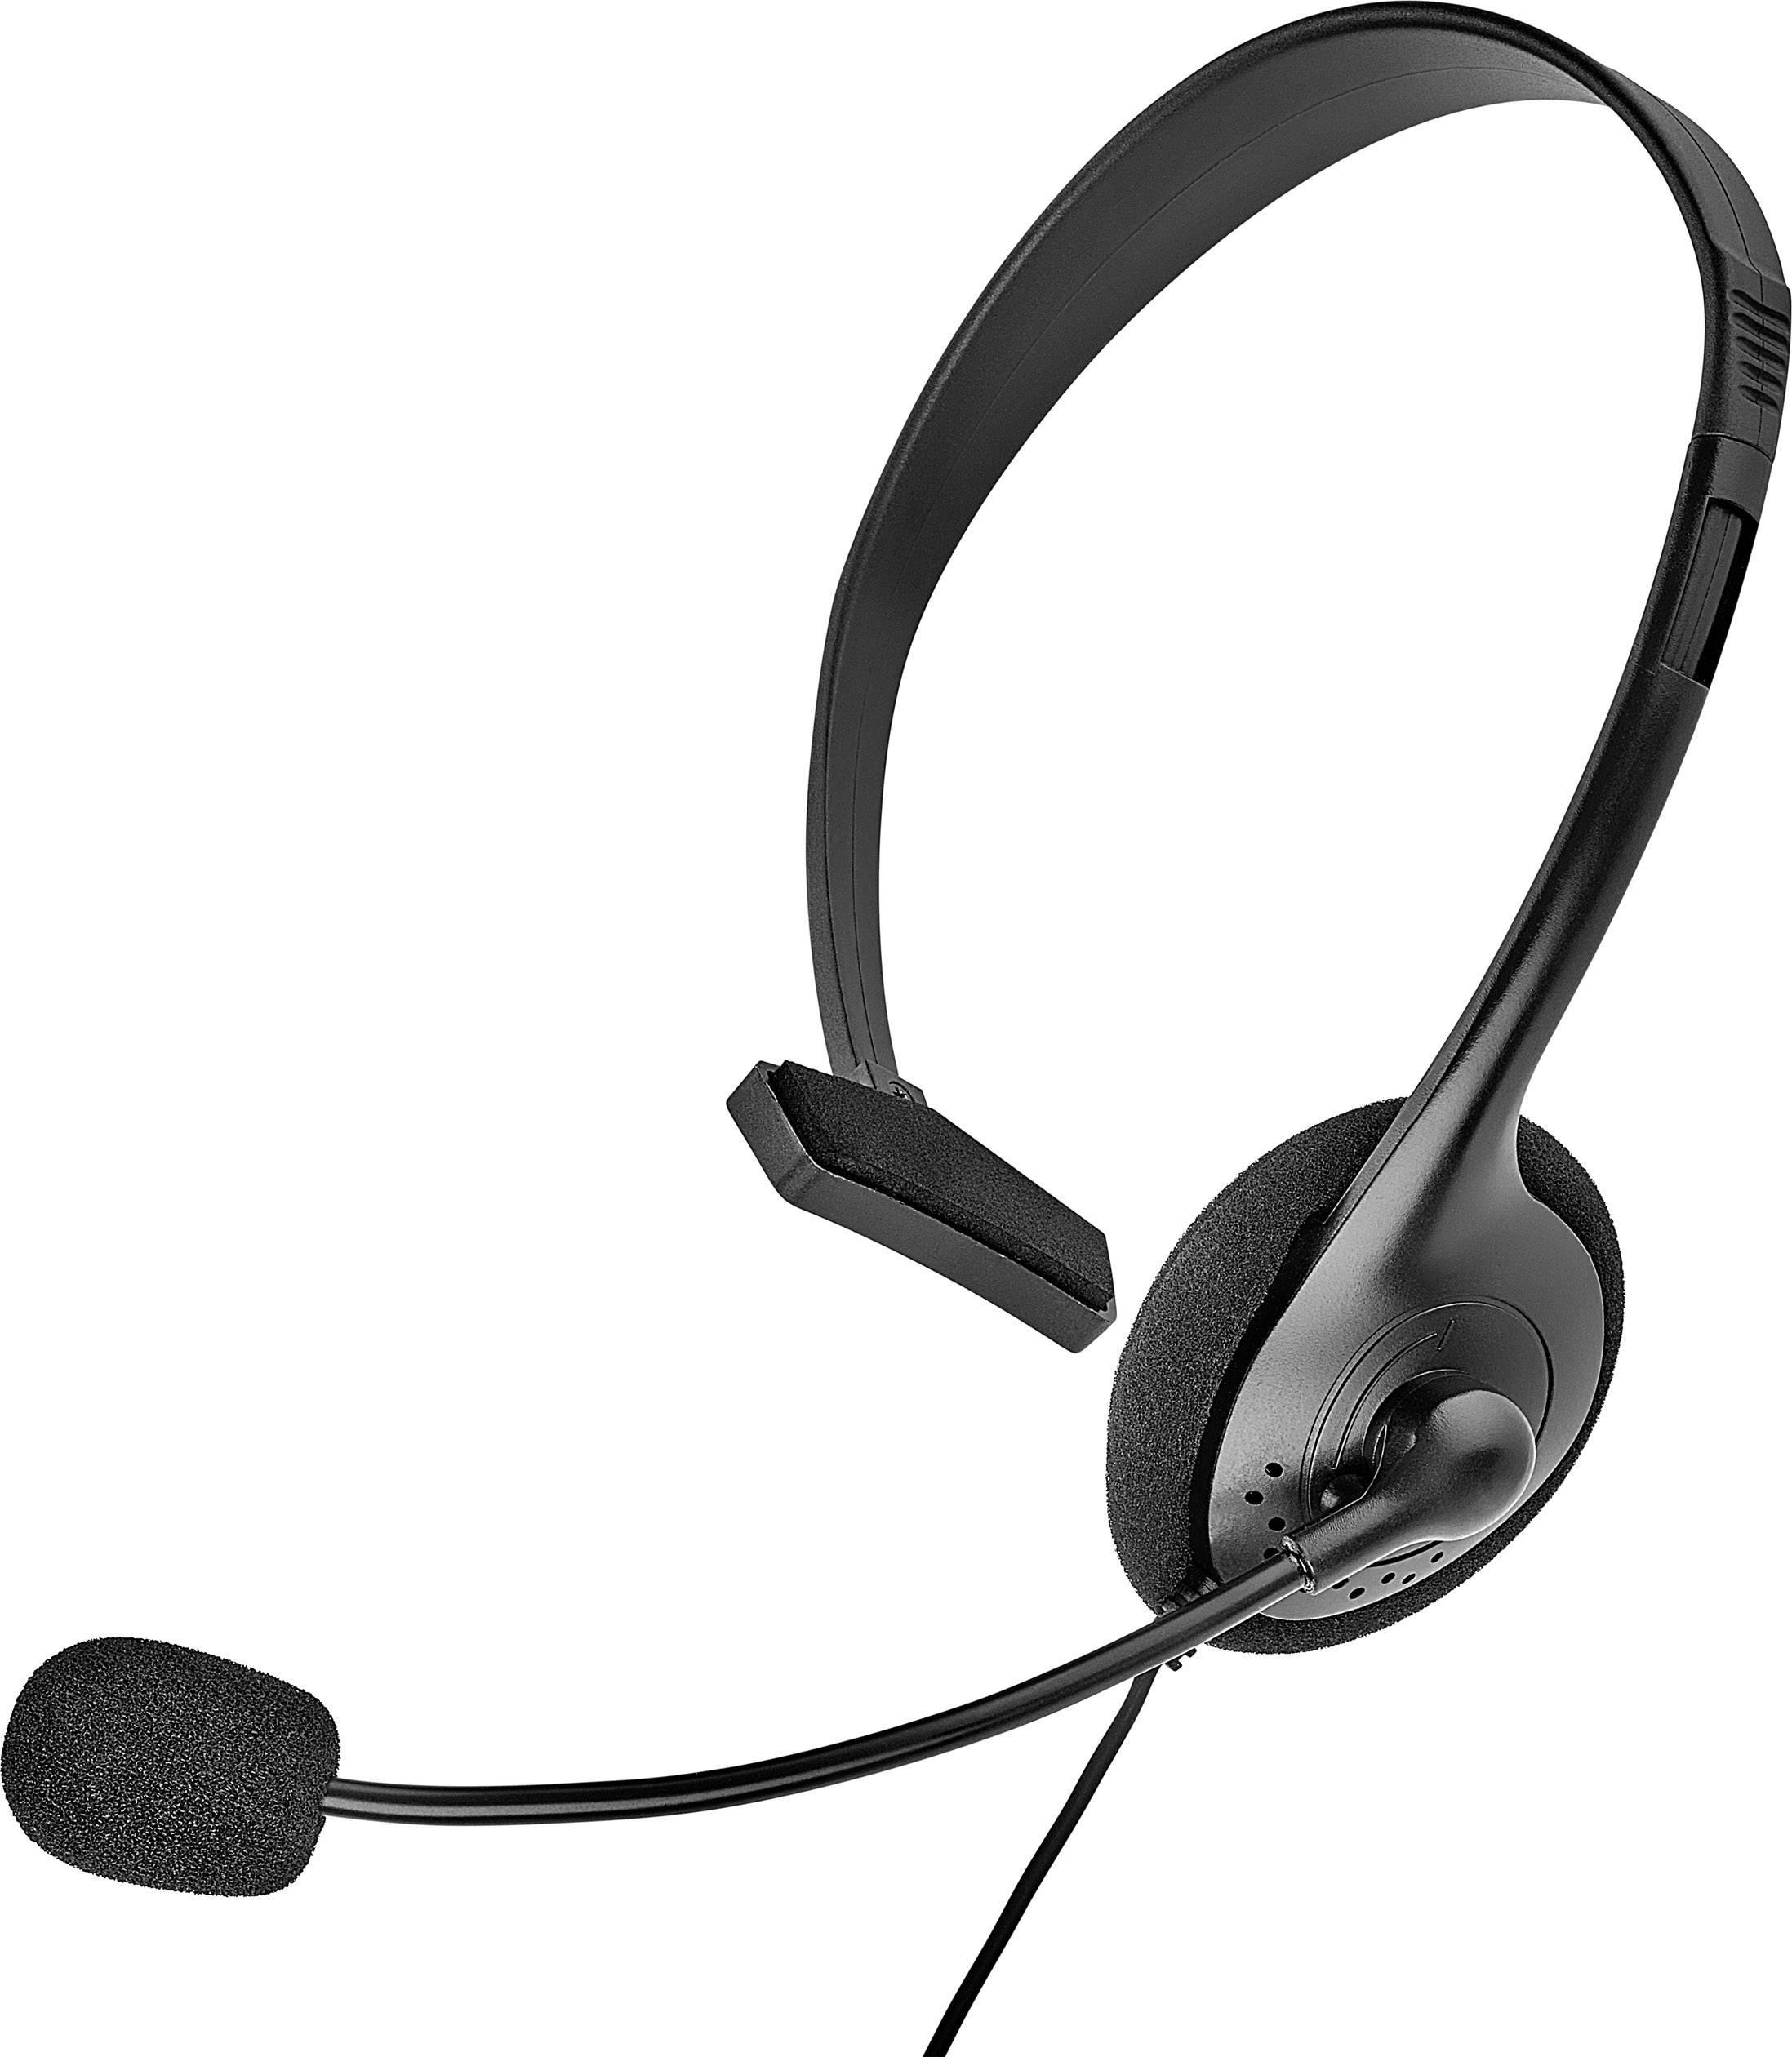 Telefónny headset Renkforce káblový, mono, čierna